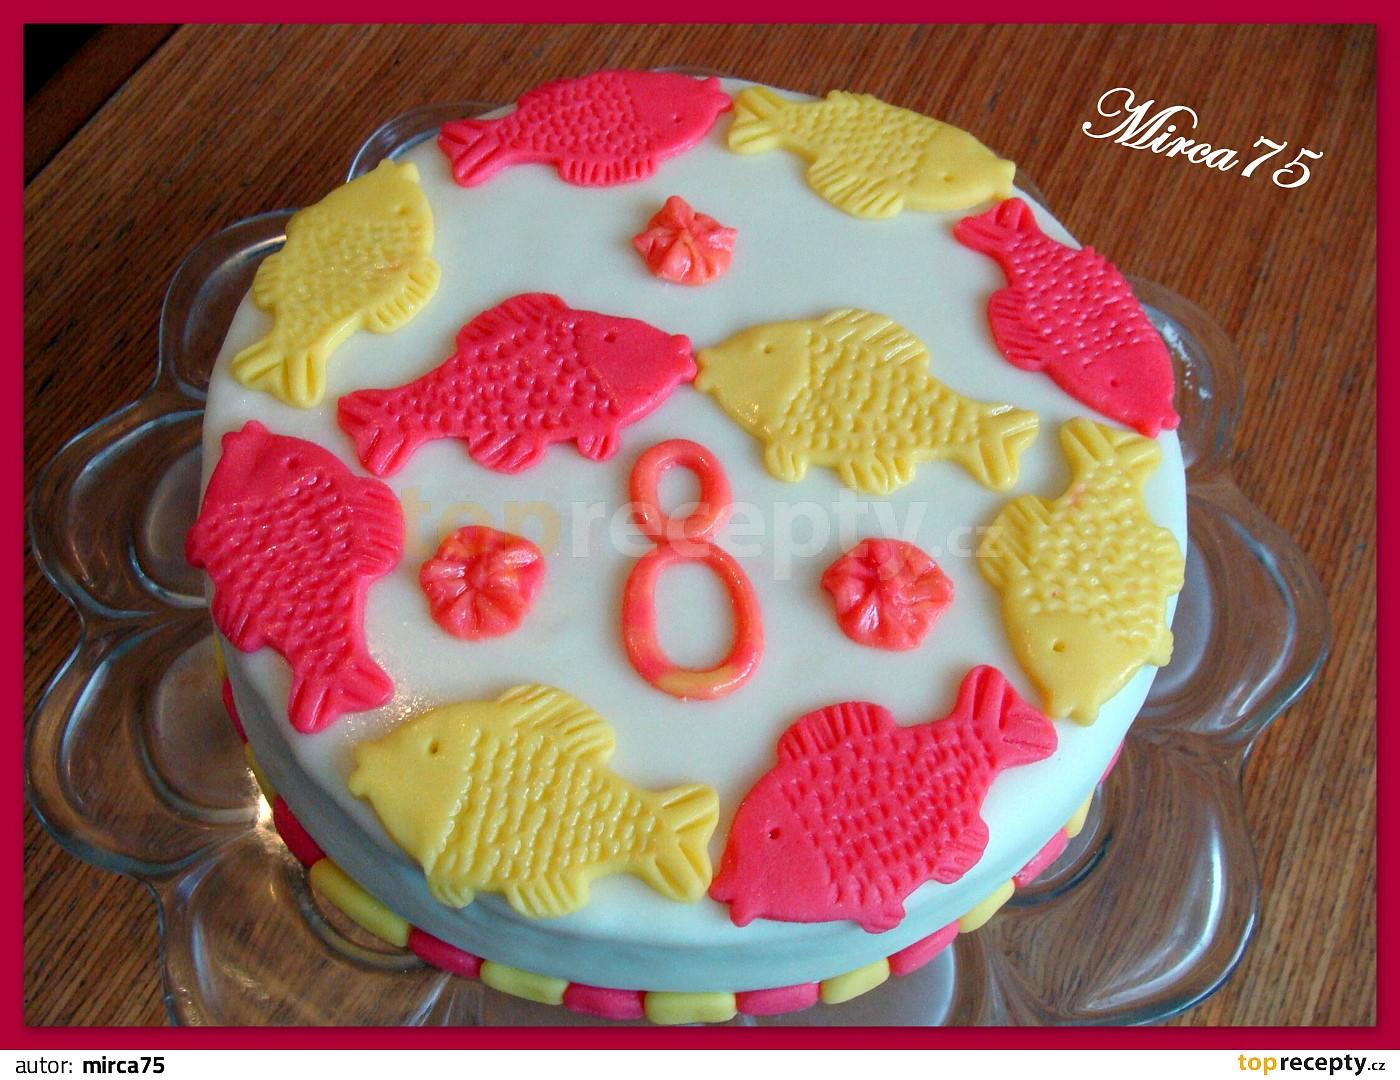 dort k narozeninám recept Potahovaný dort k narozeninám recept   TopRecepty.cz dort k narozeninám recept